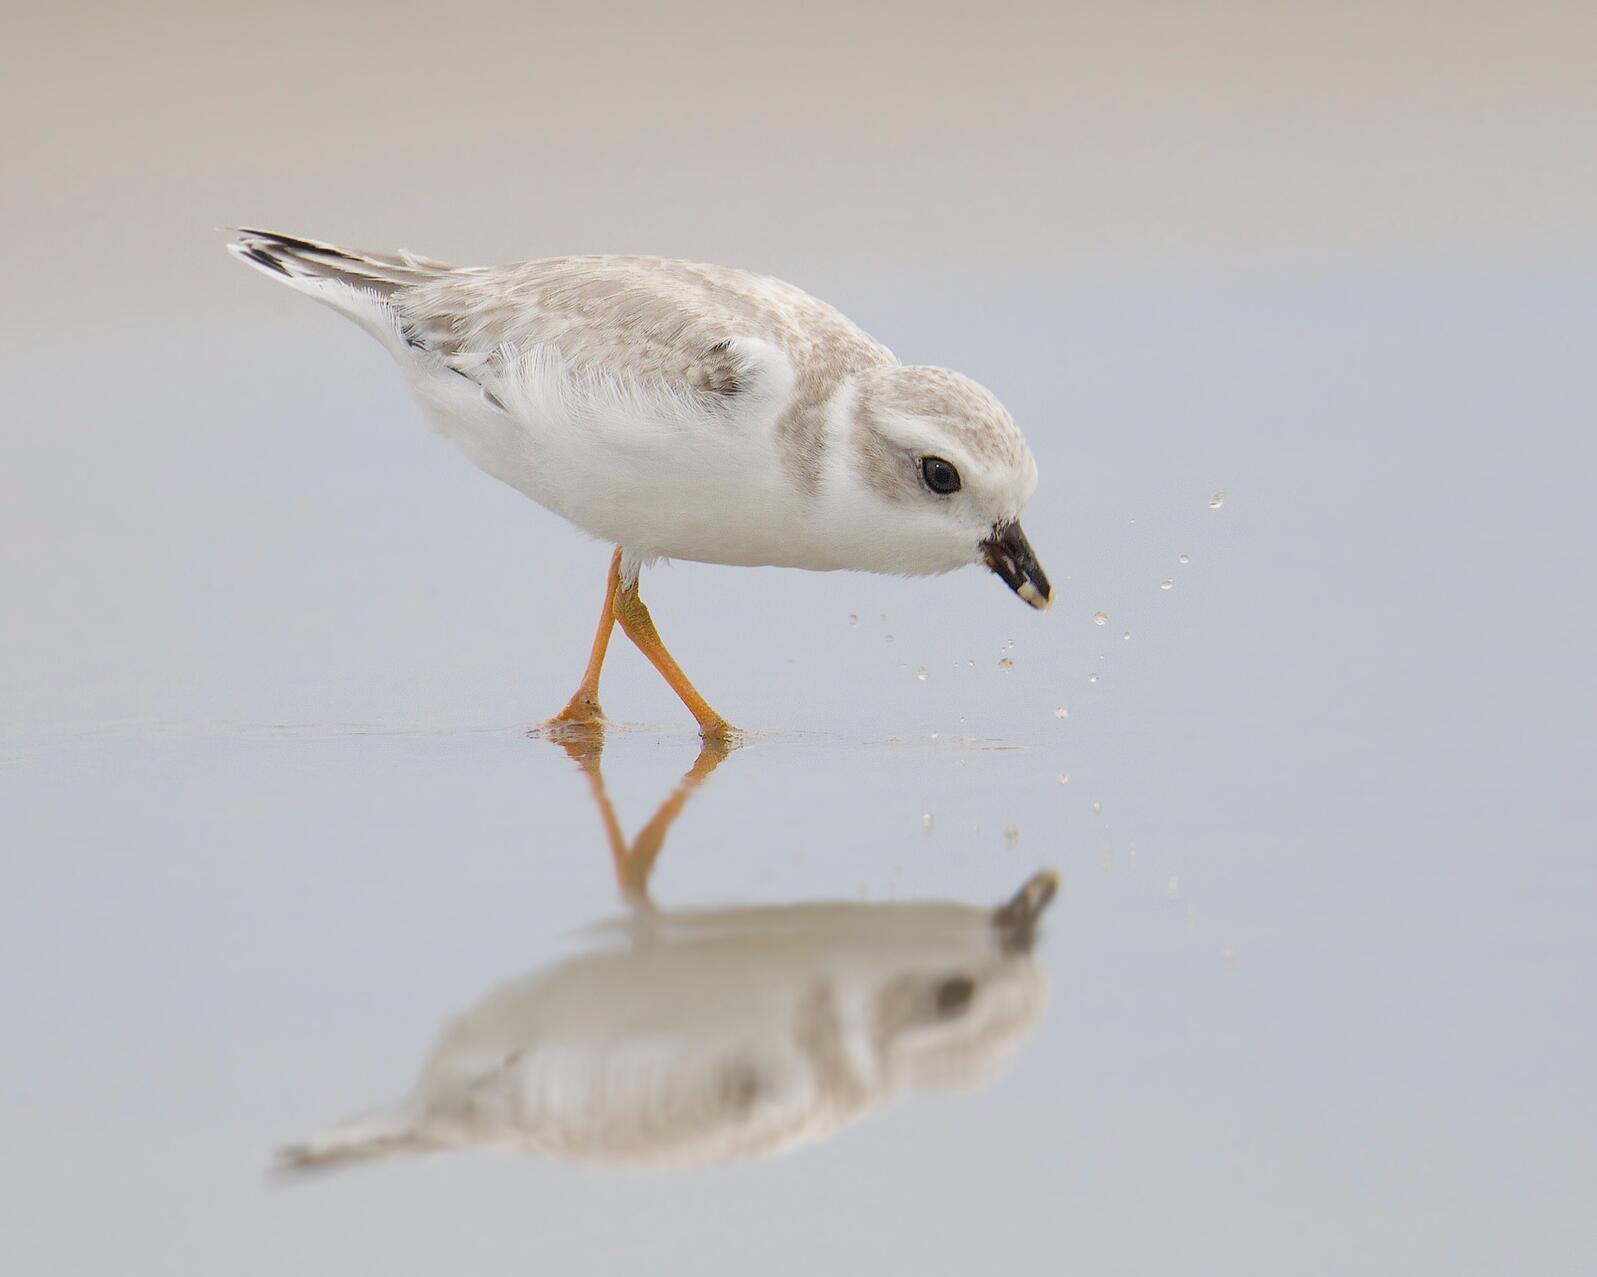 Piping Plover Kimberley Caruso/Audubon Photography Awards